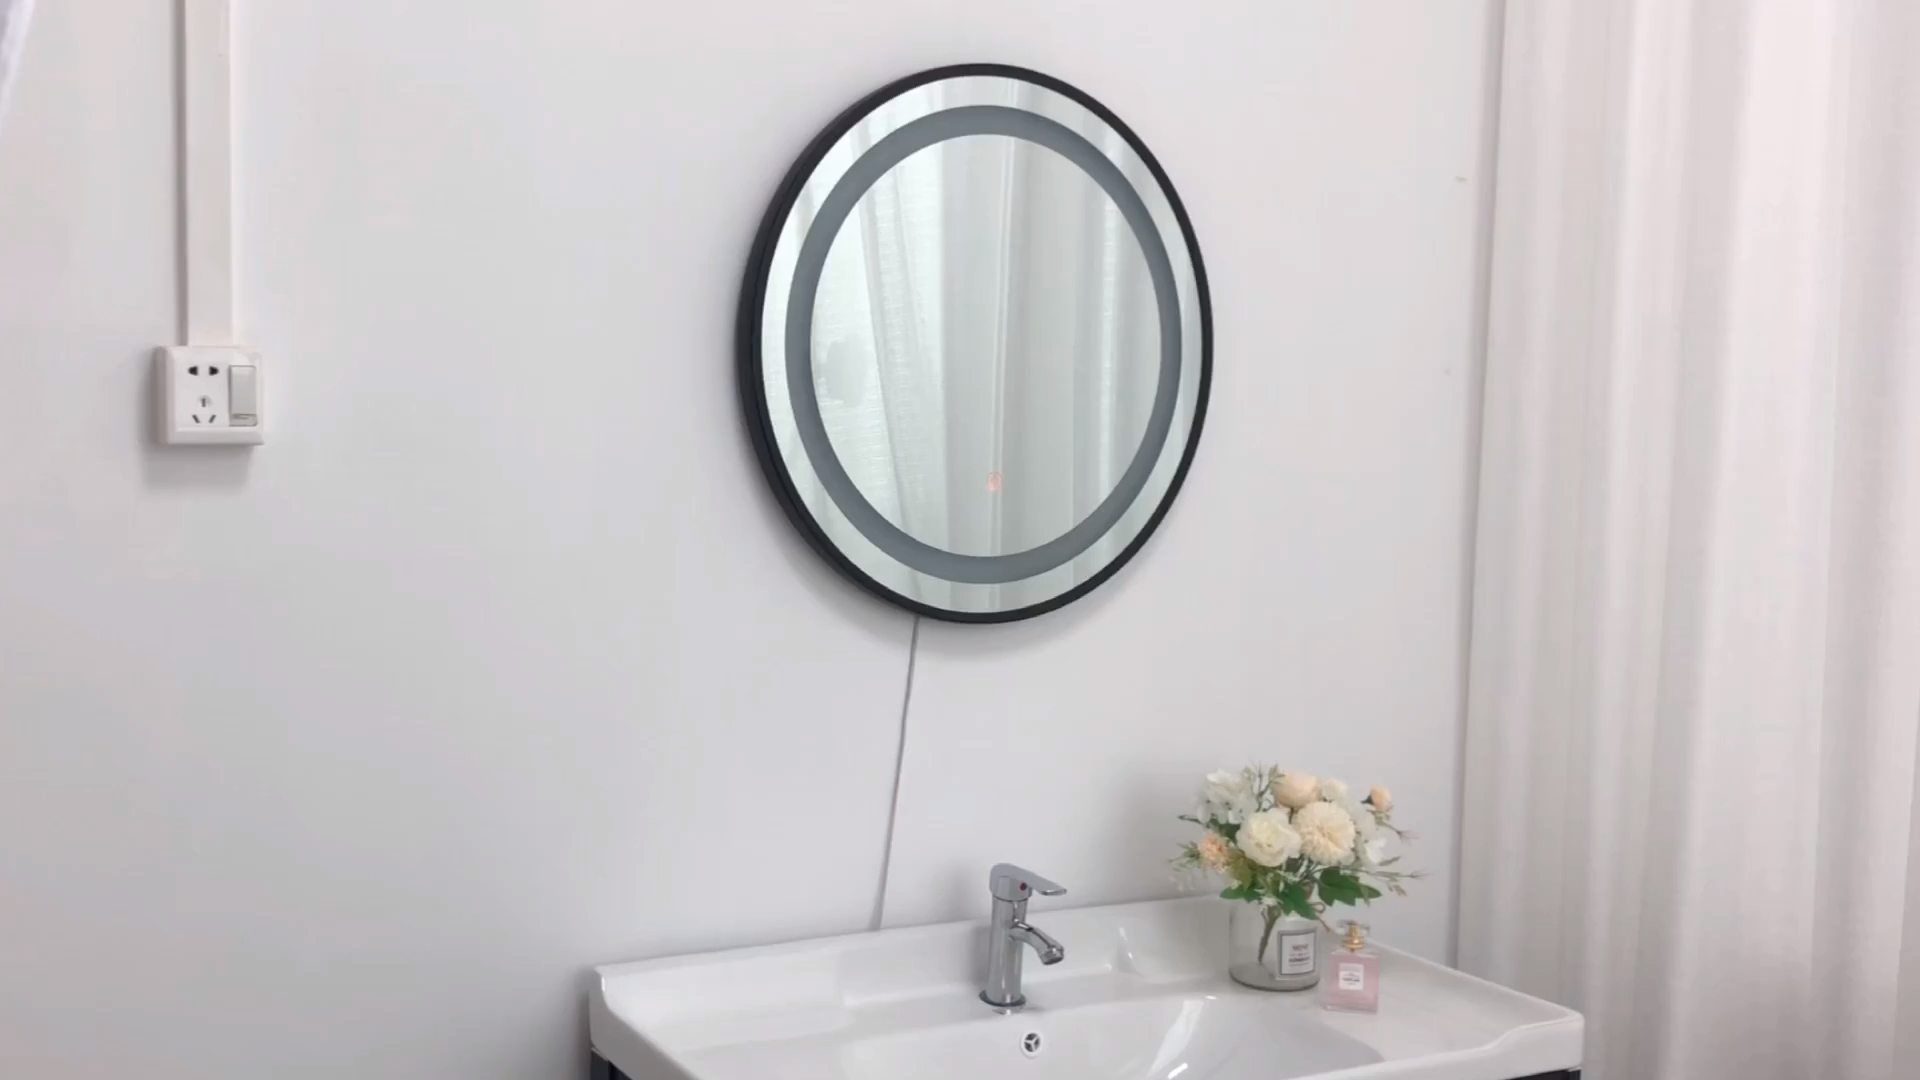 Led illuminated bathroom mirror light intelligent anti-fog touch switch frameless bathroom mirror wall hanging hotel custom